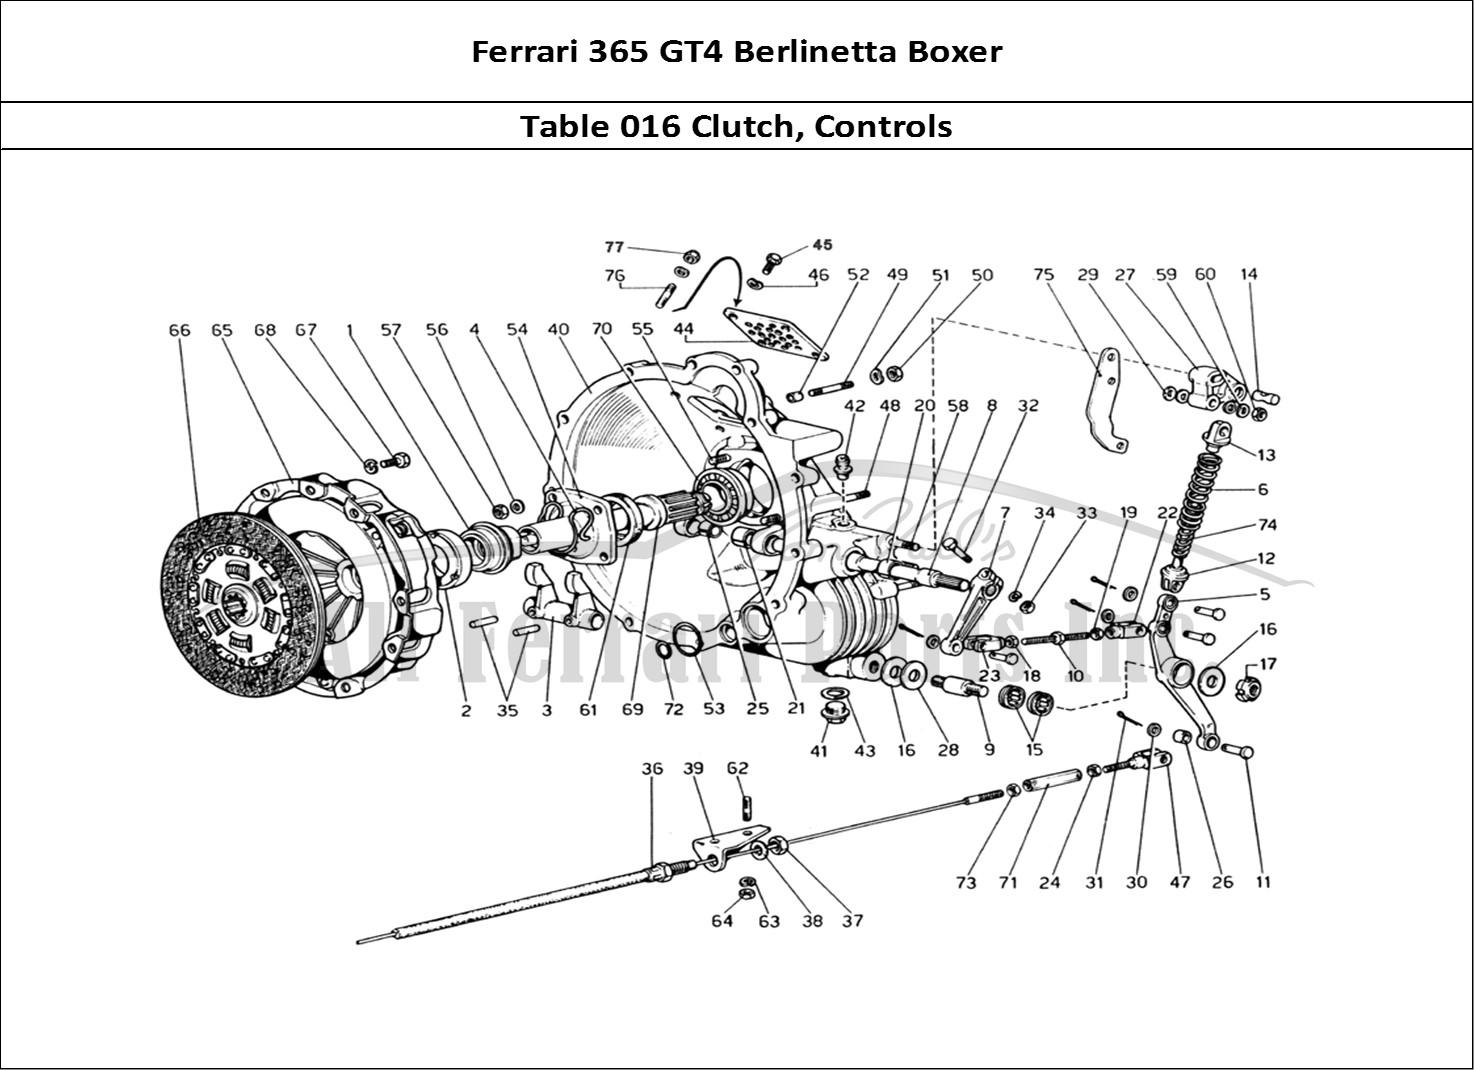 Buy original Ferrari 365 GT4 Berlinetta Boxer 016 Clutch